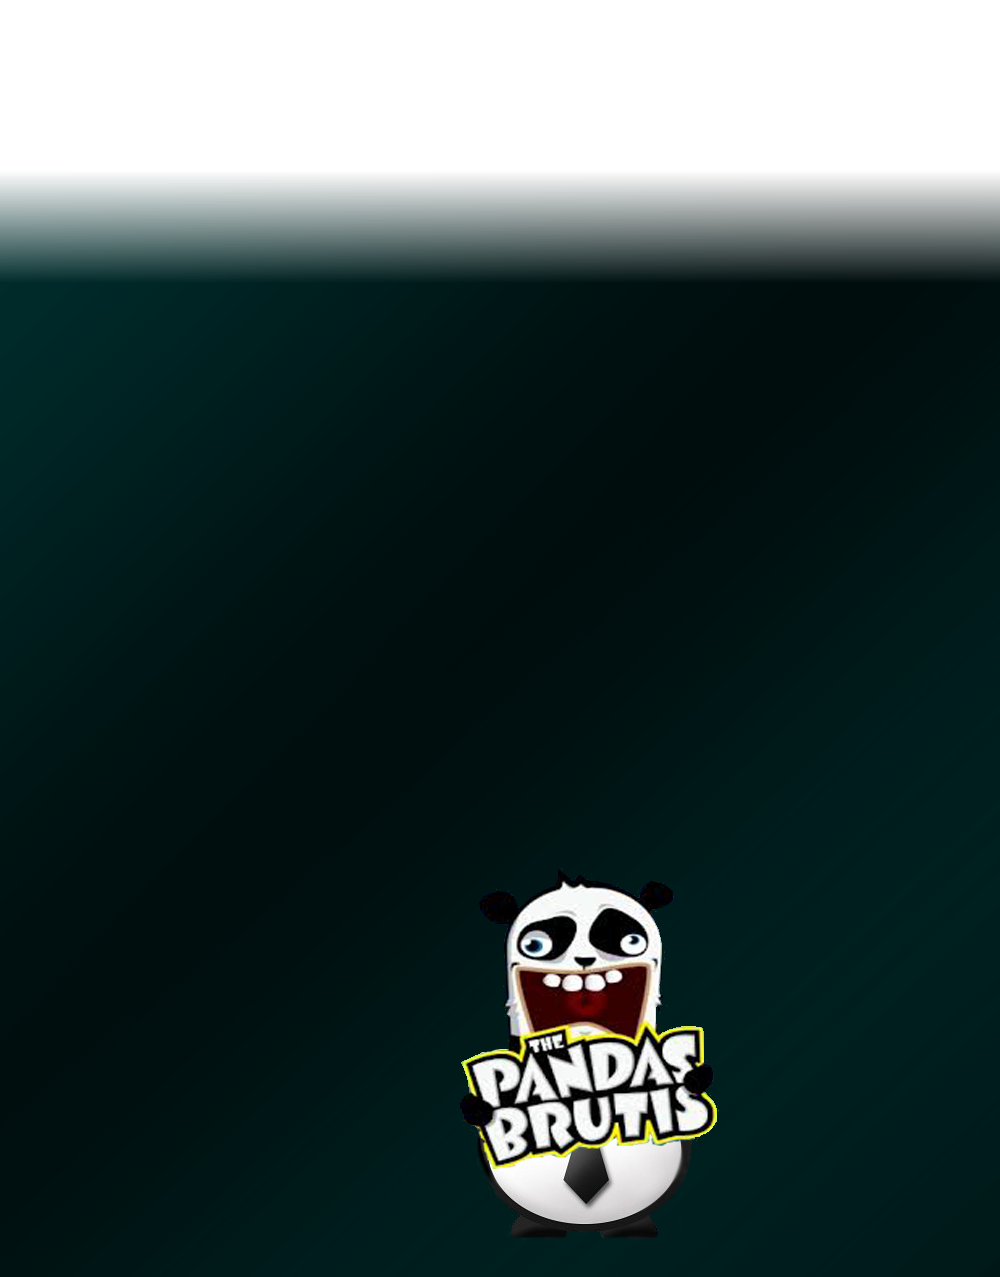 La boite à trucs PandasbrutiPapier